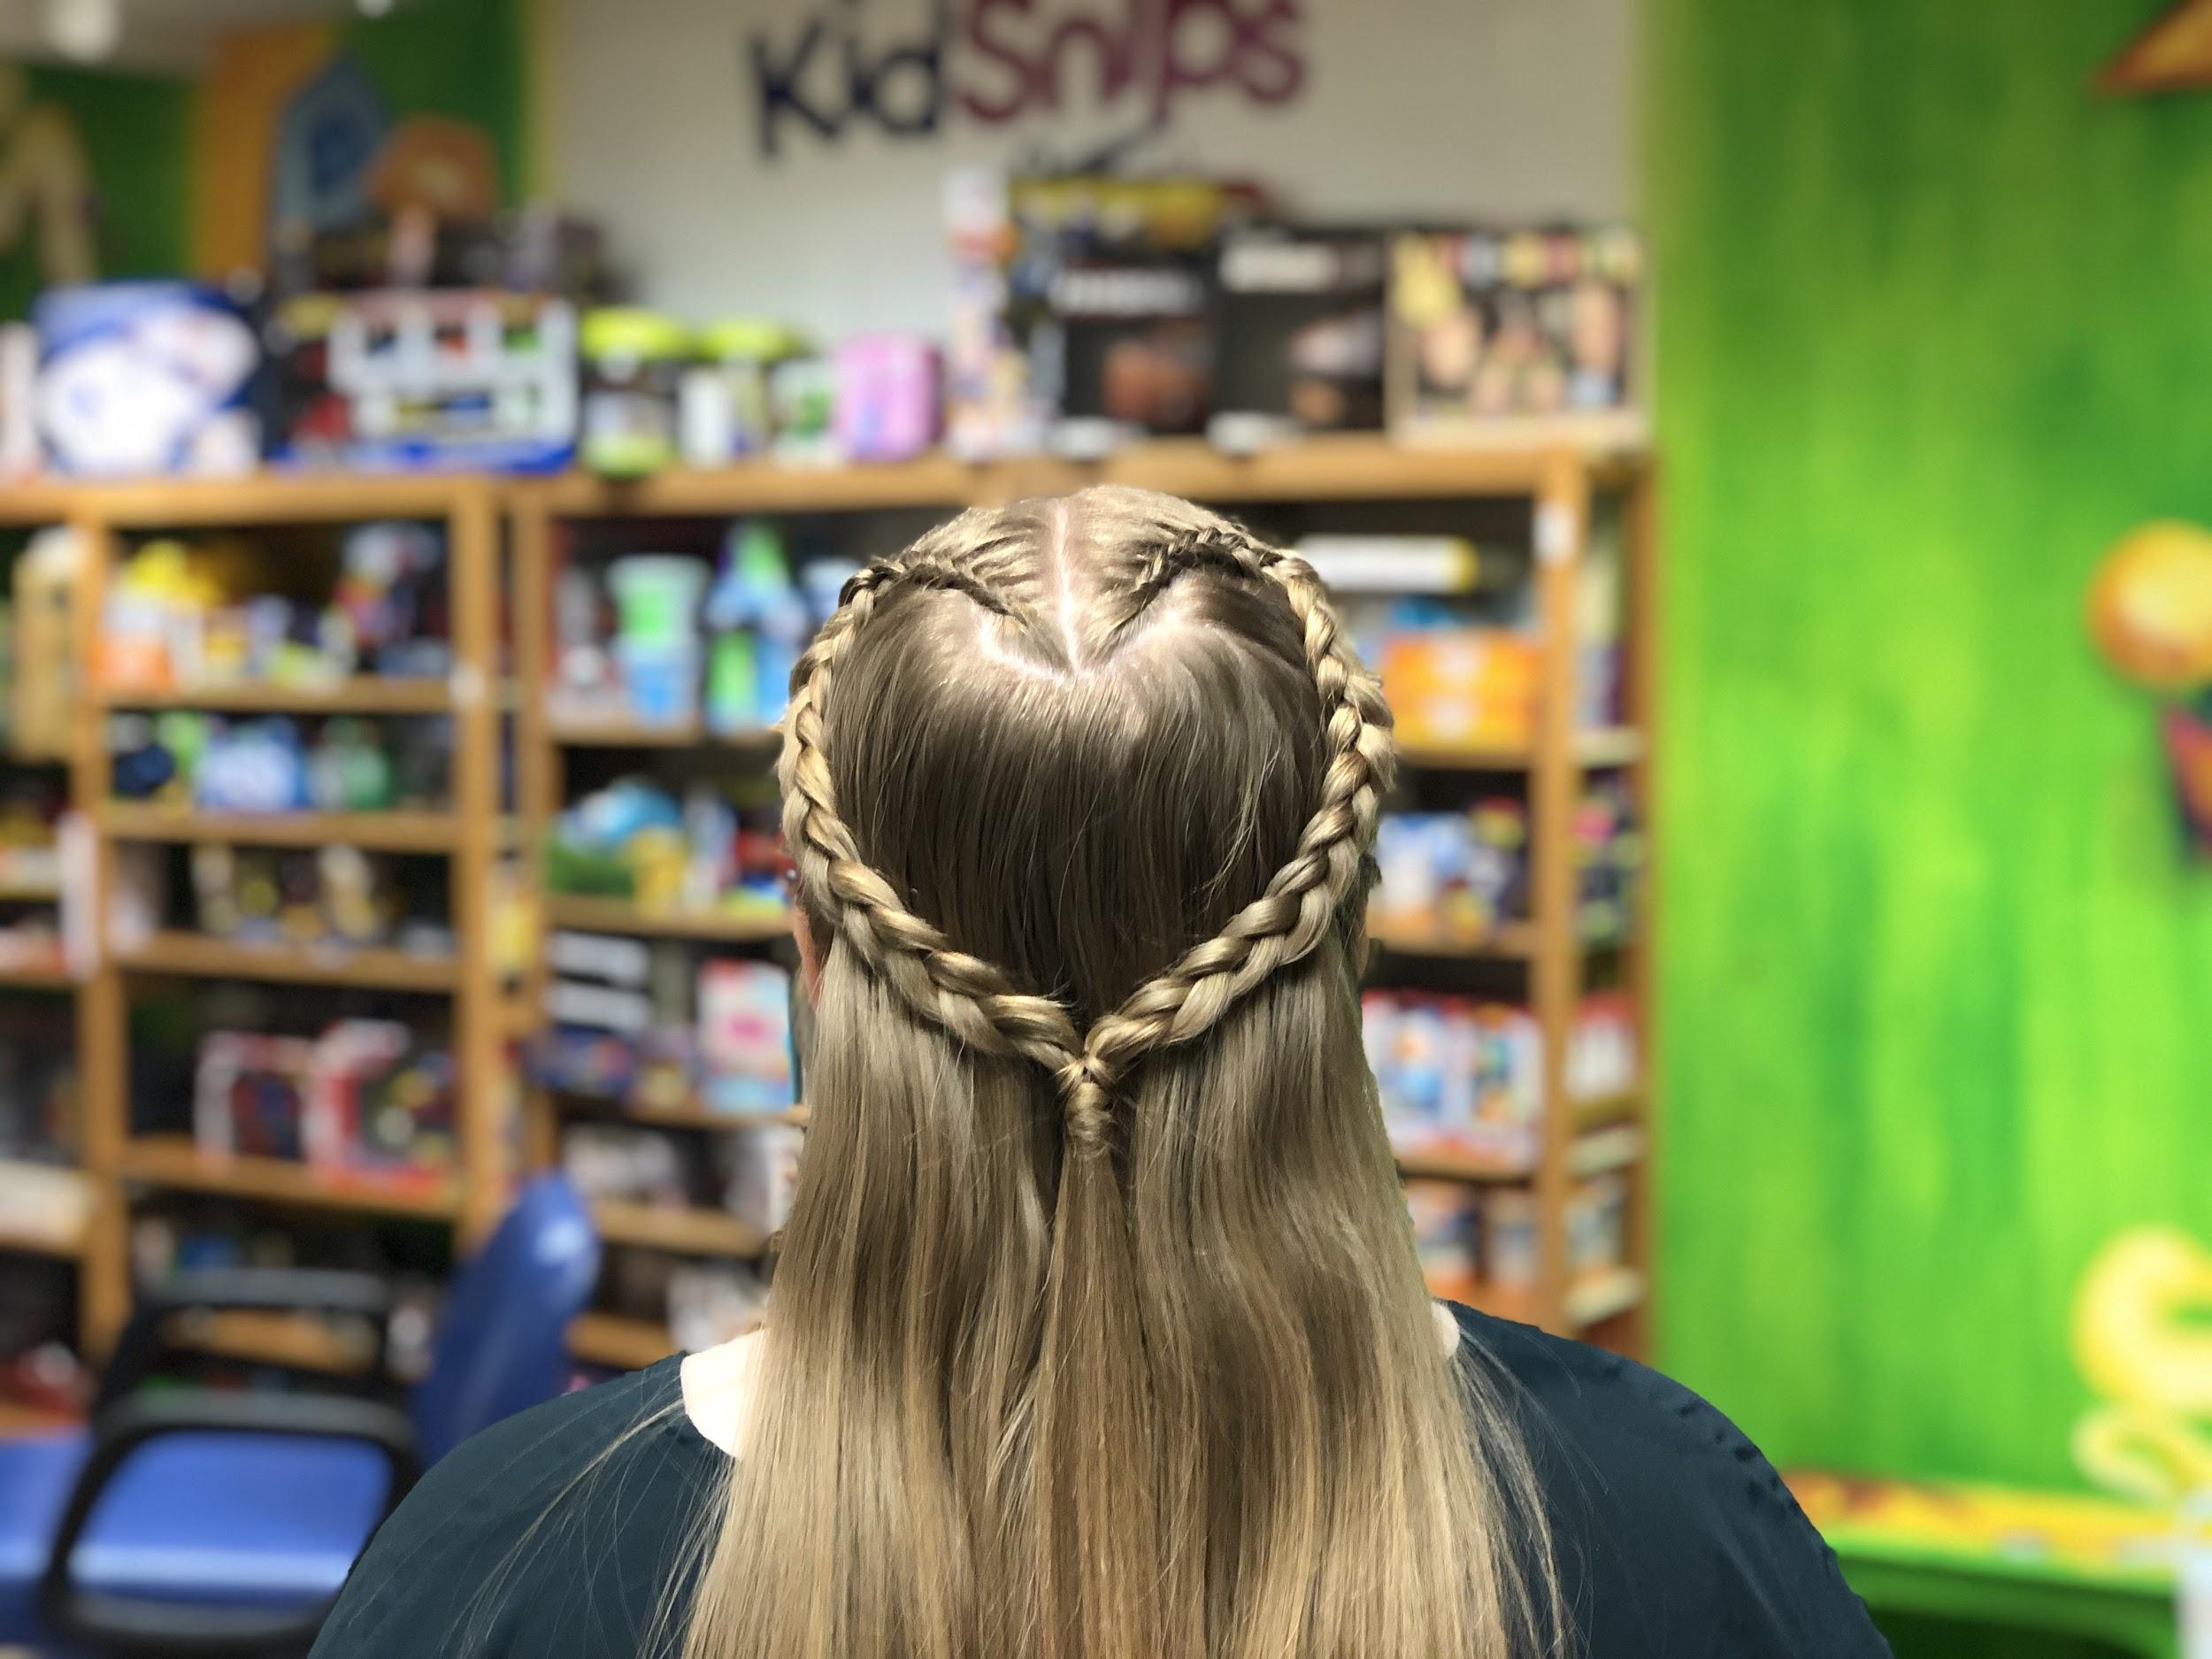 heart braid photo from Jill Jensen